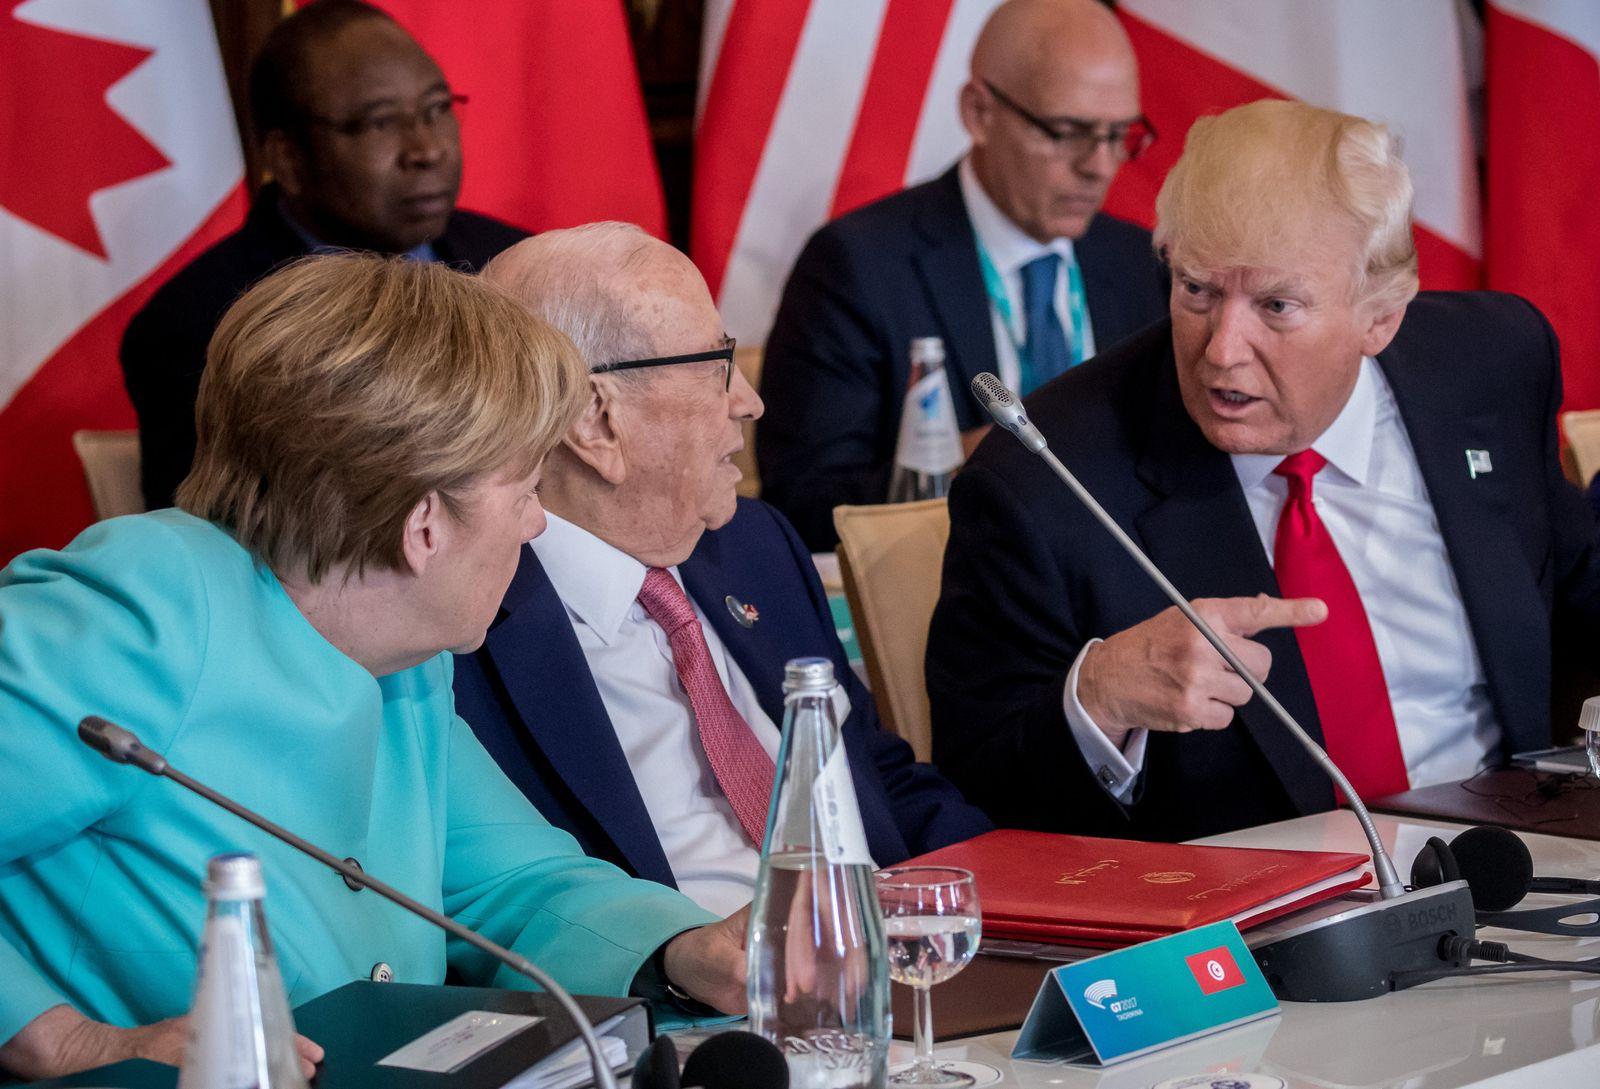 G7-Gipfel in Sizilien/ Trump/ Merkel